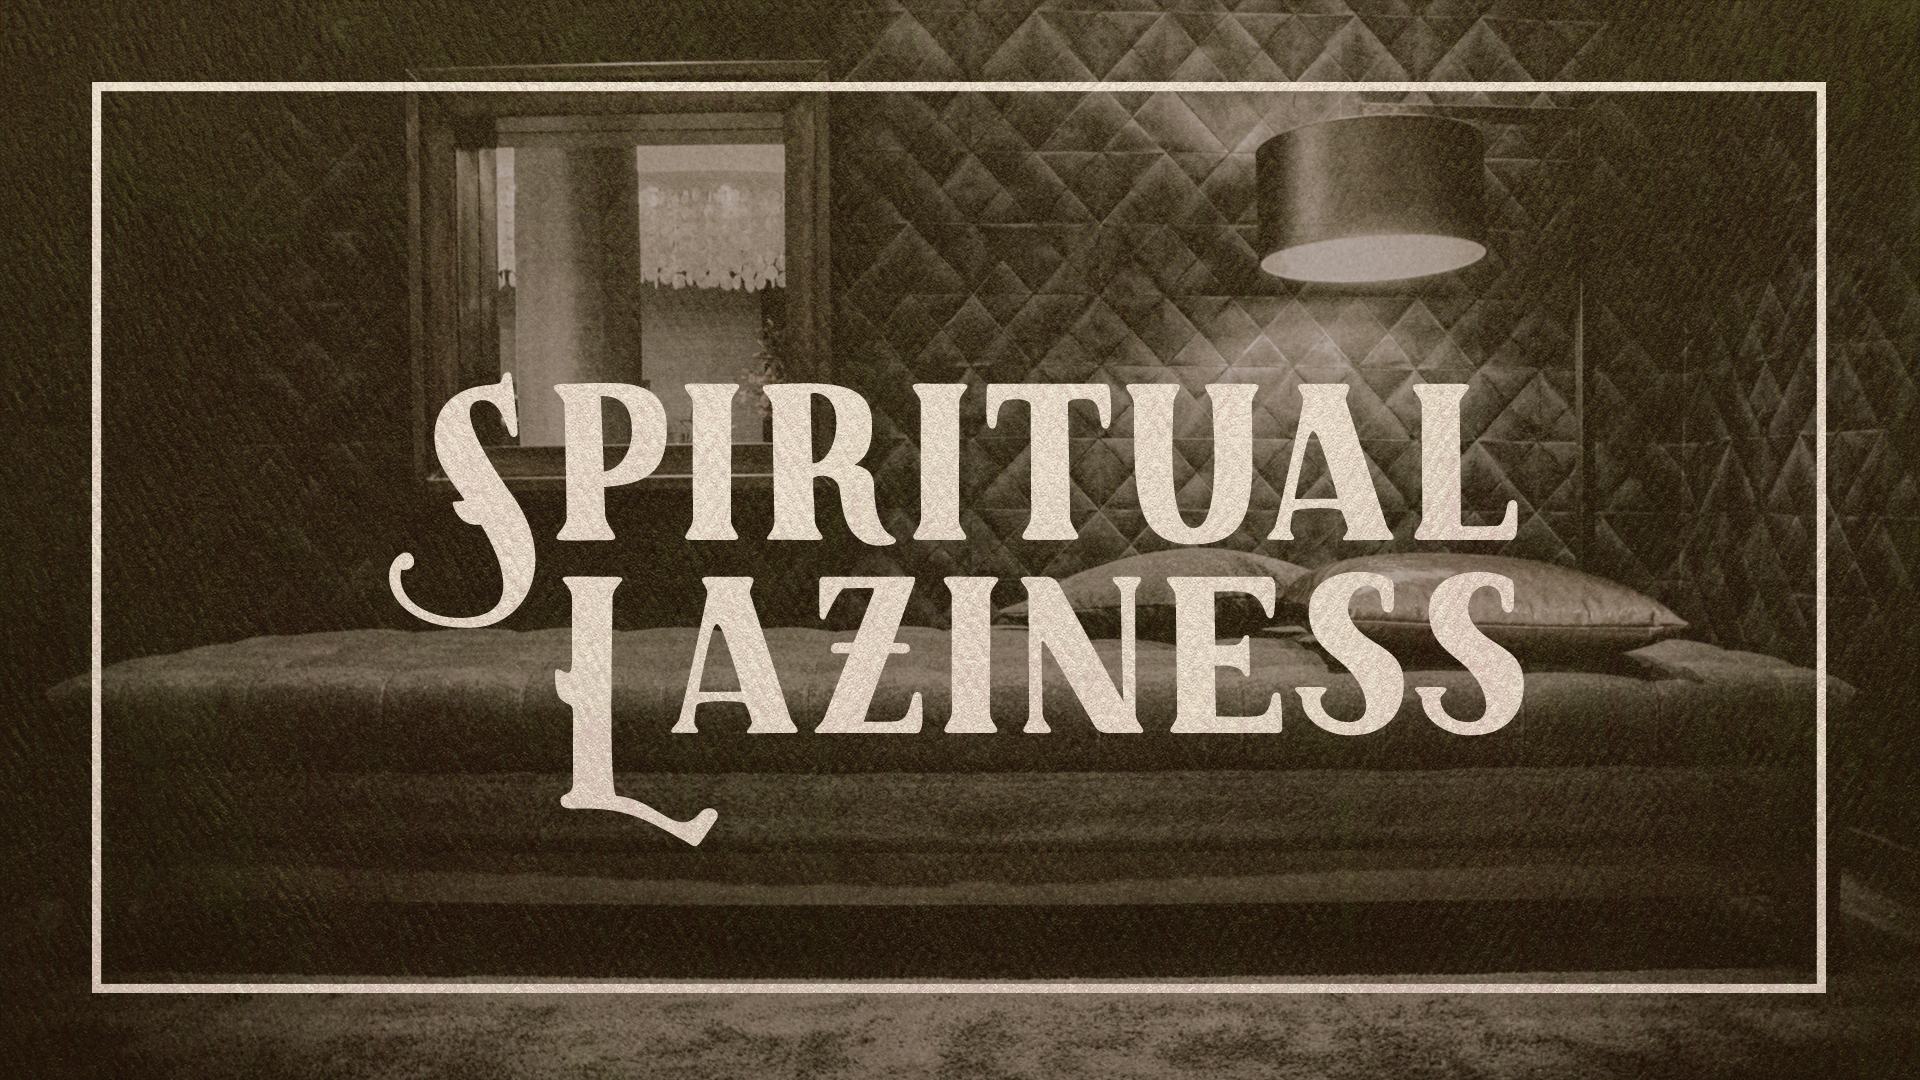 Spiritual-Laziness.jpg